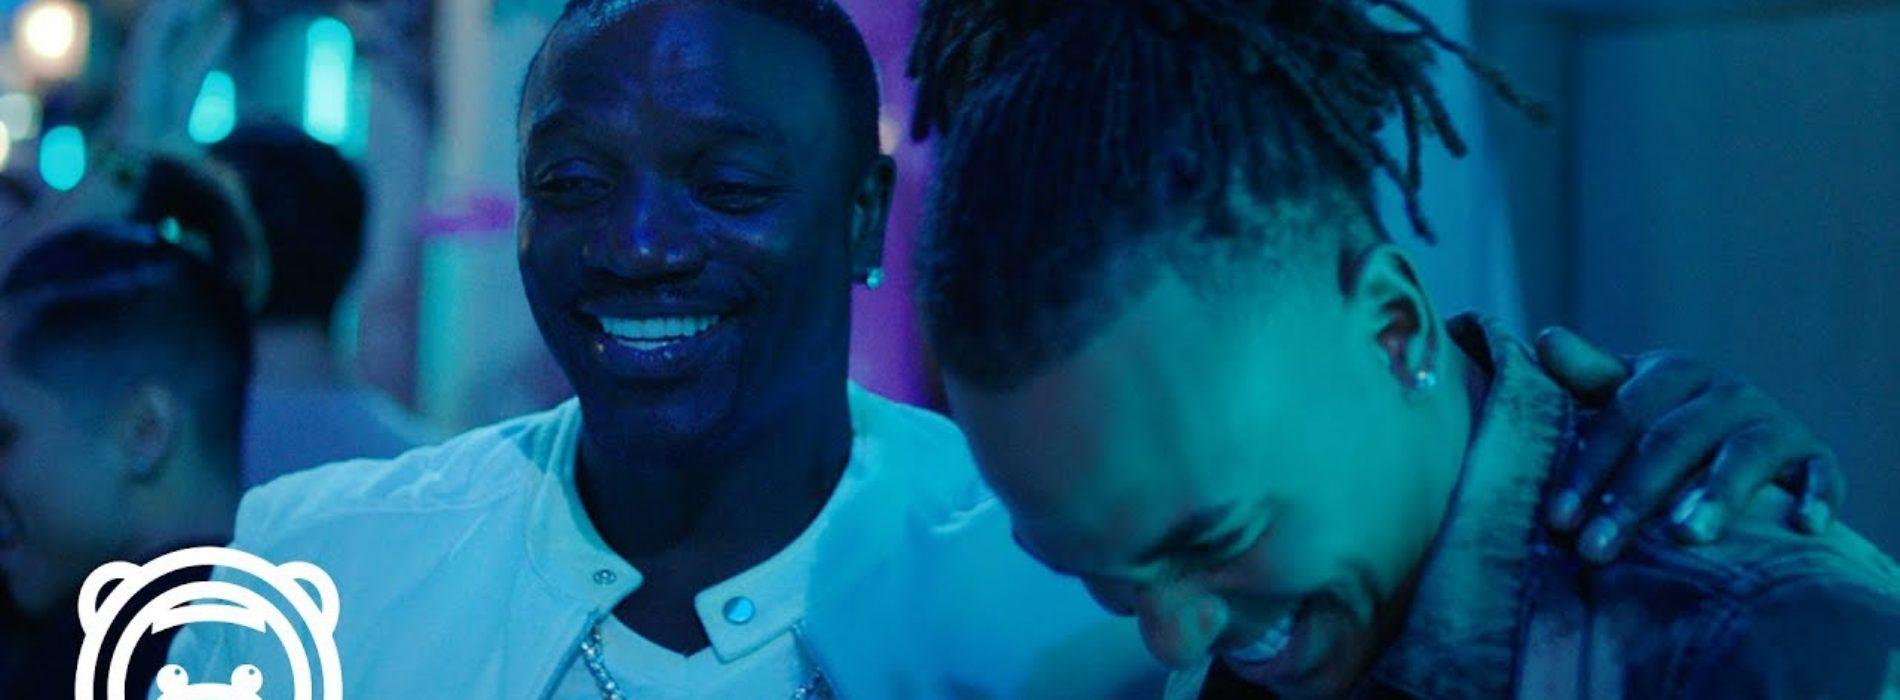 Ozuna – Coméntale Feat. Akon (Video Oficial) – Septembre 2018